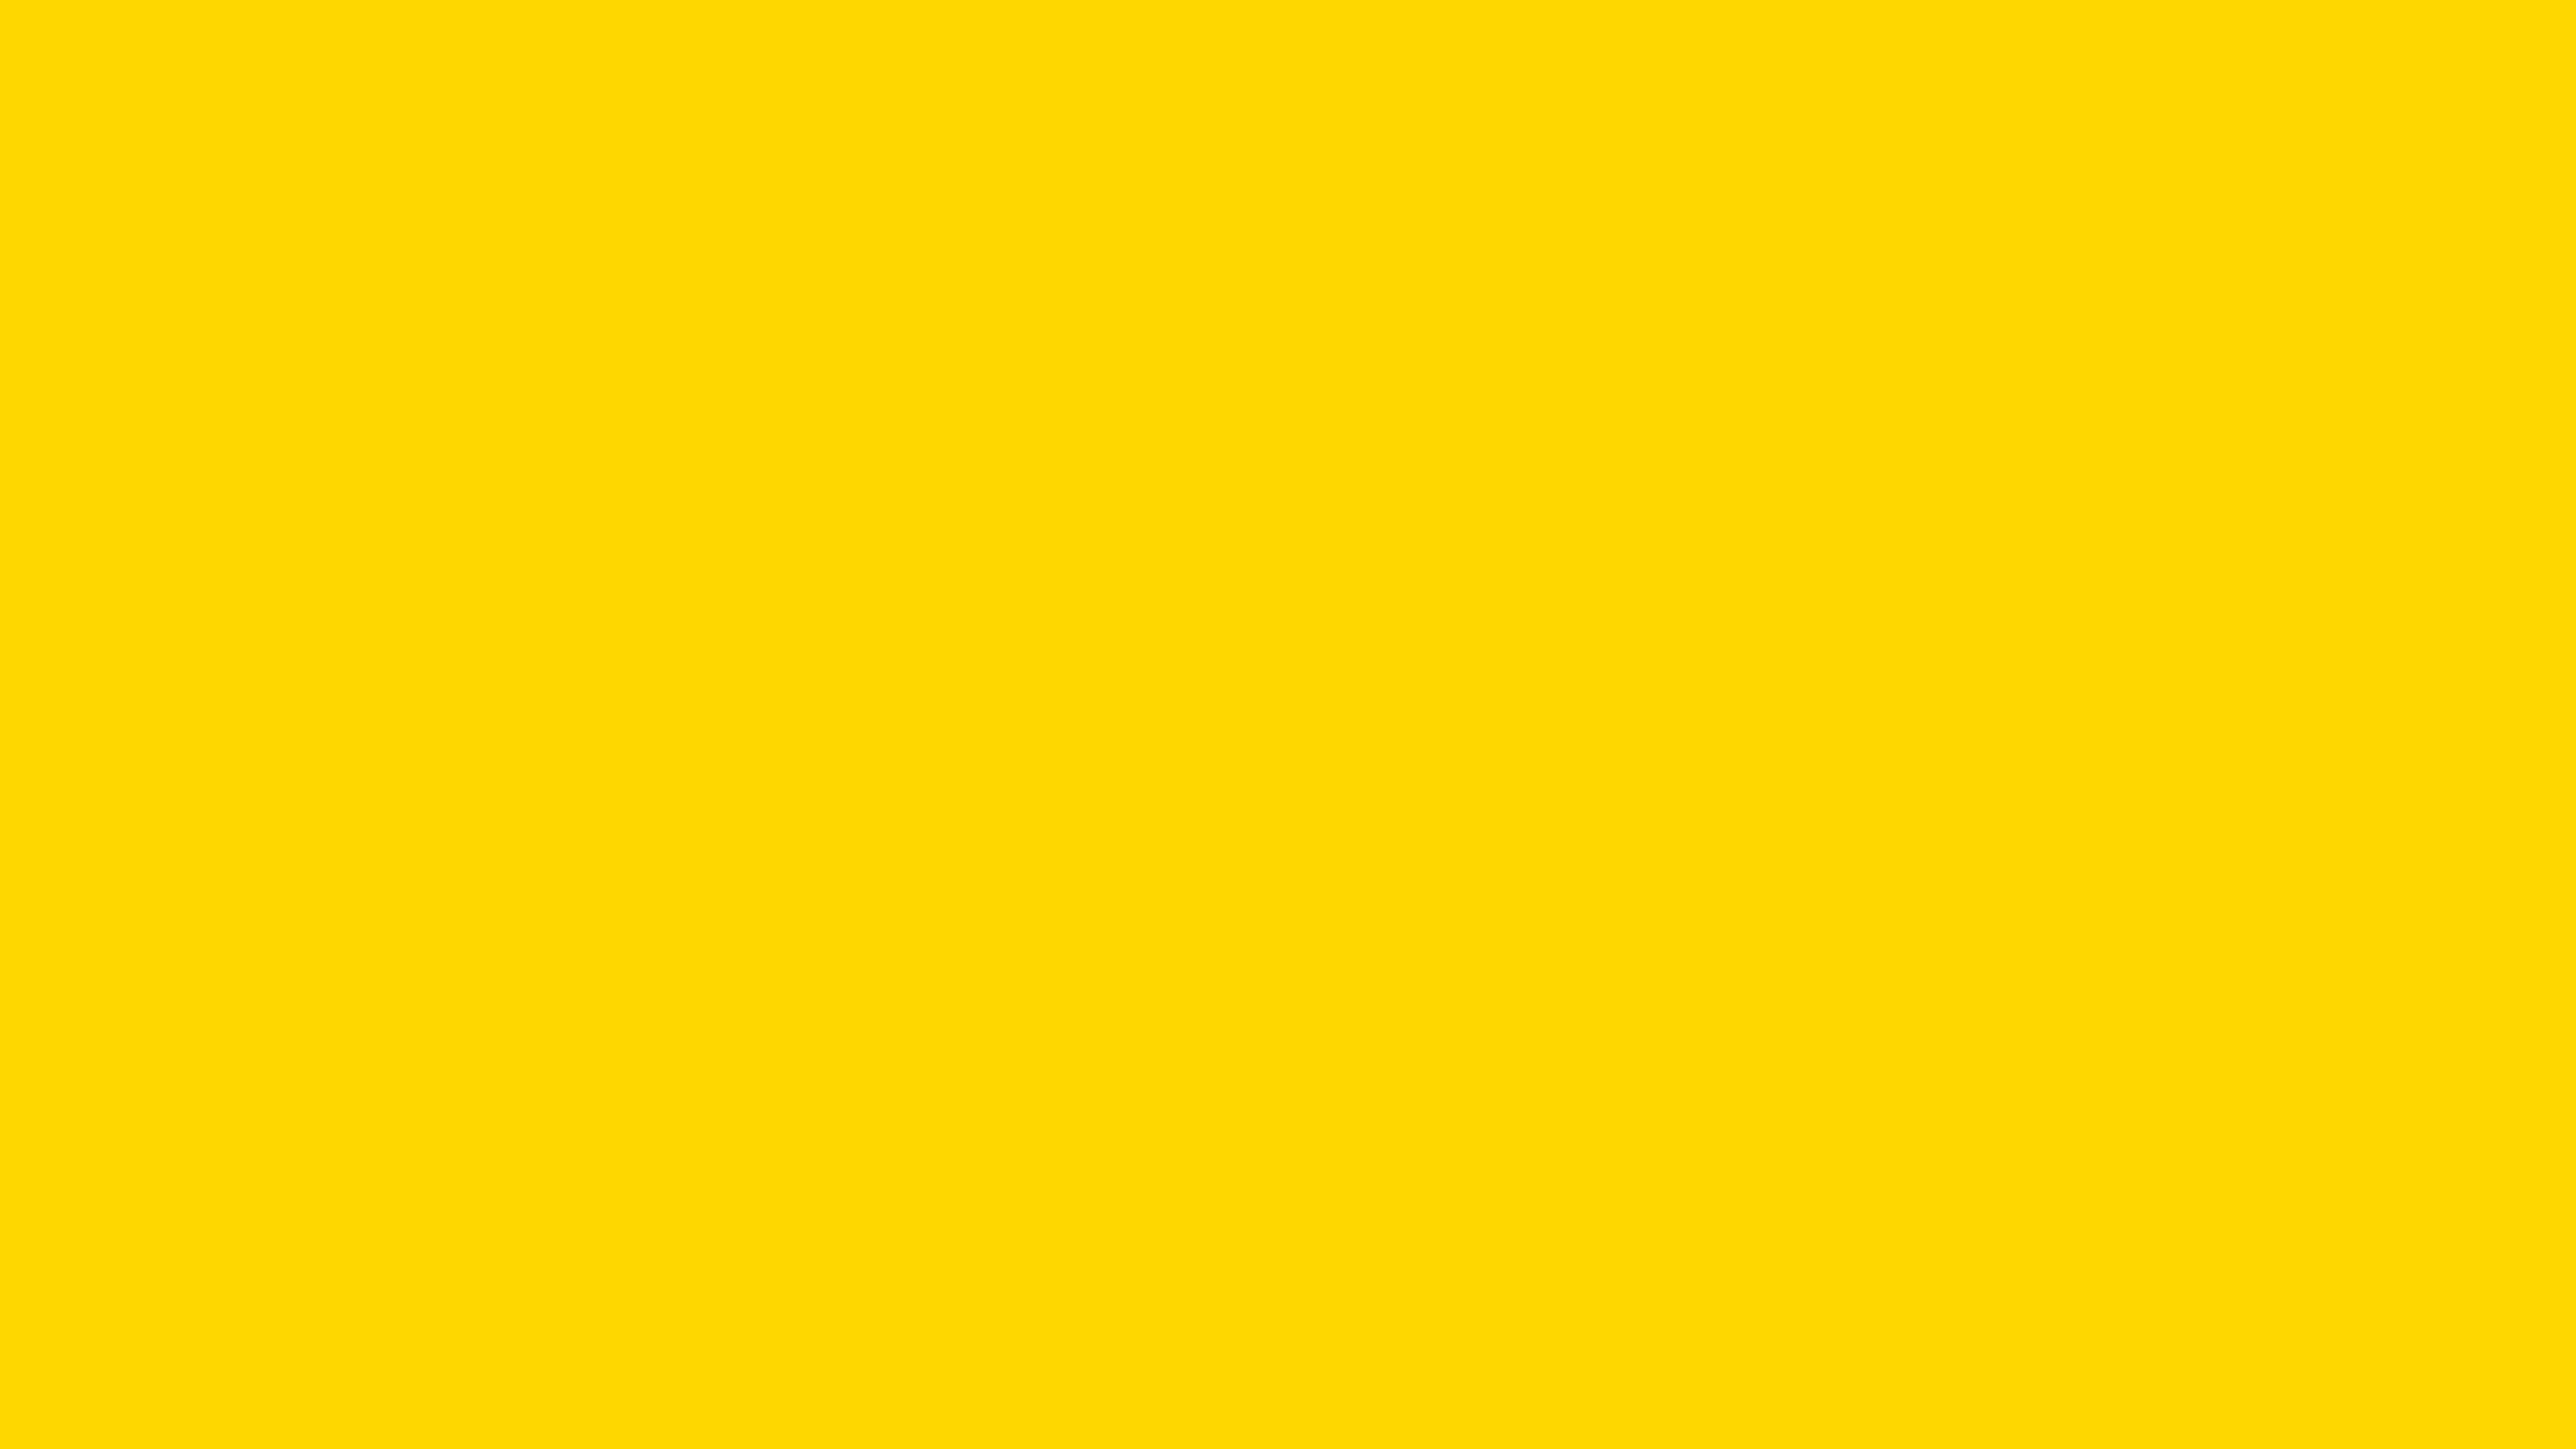 7680x4320 Gold Web Golden Solid Color Background